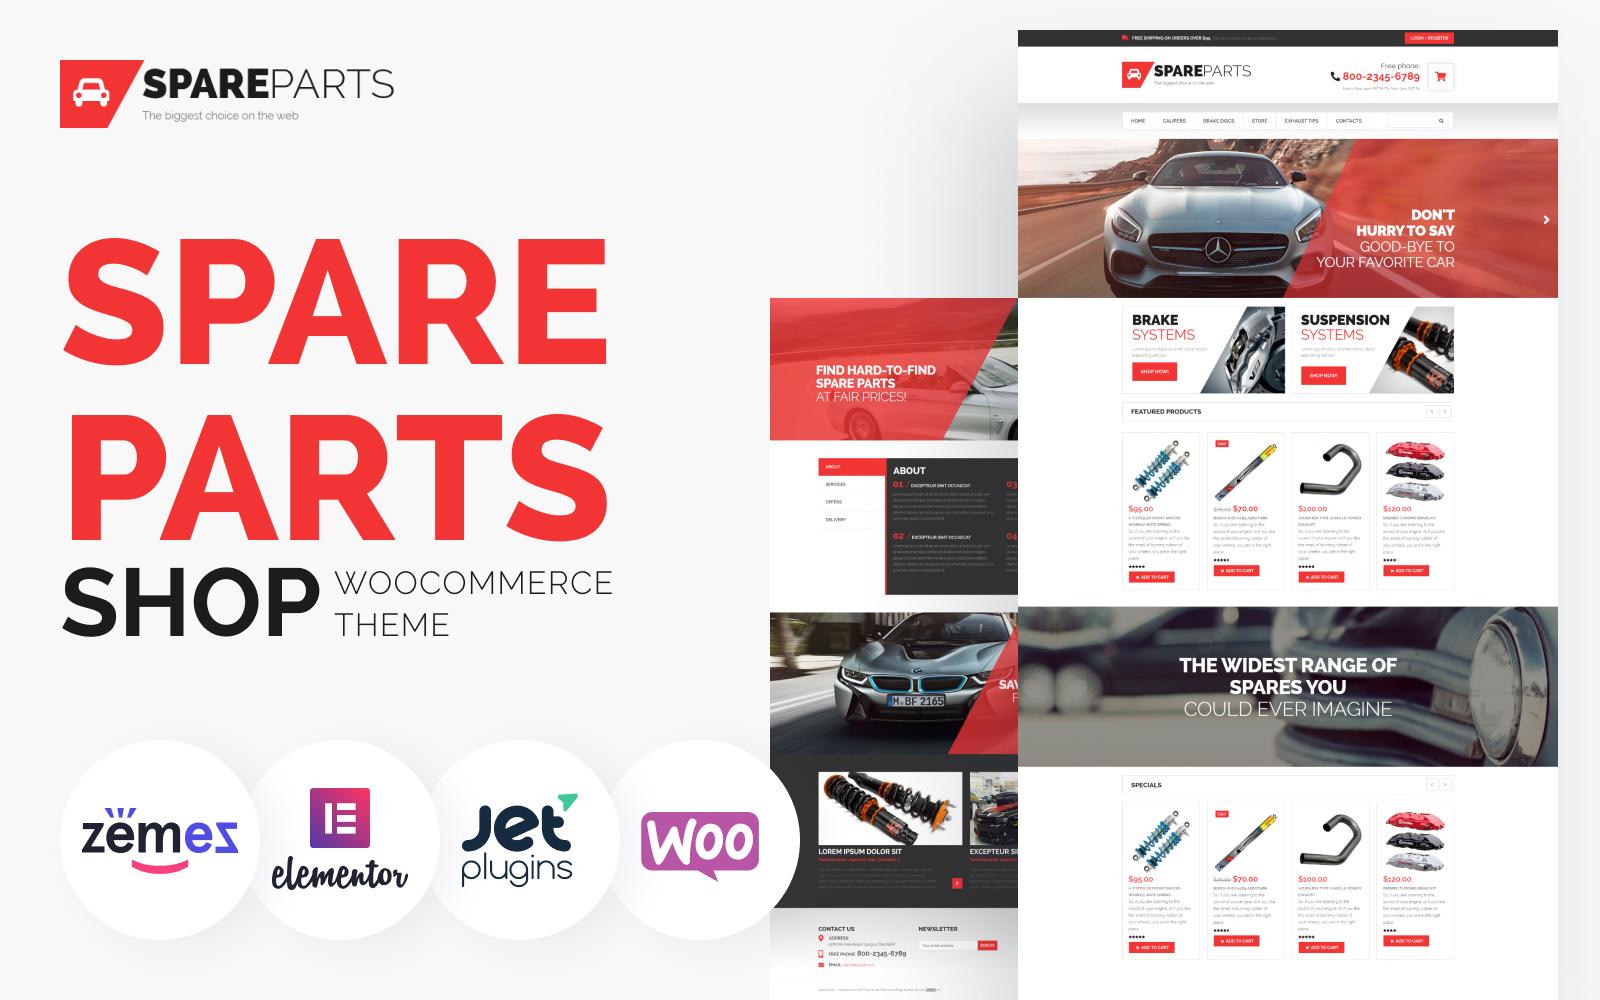 """SpareParts - Spare Parts Shop ECommerce Modern Elementor"" 响应式WooCommerce模板 #53307"